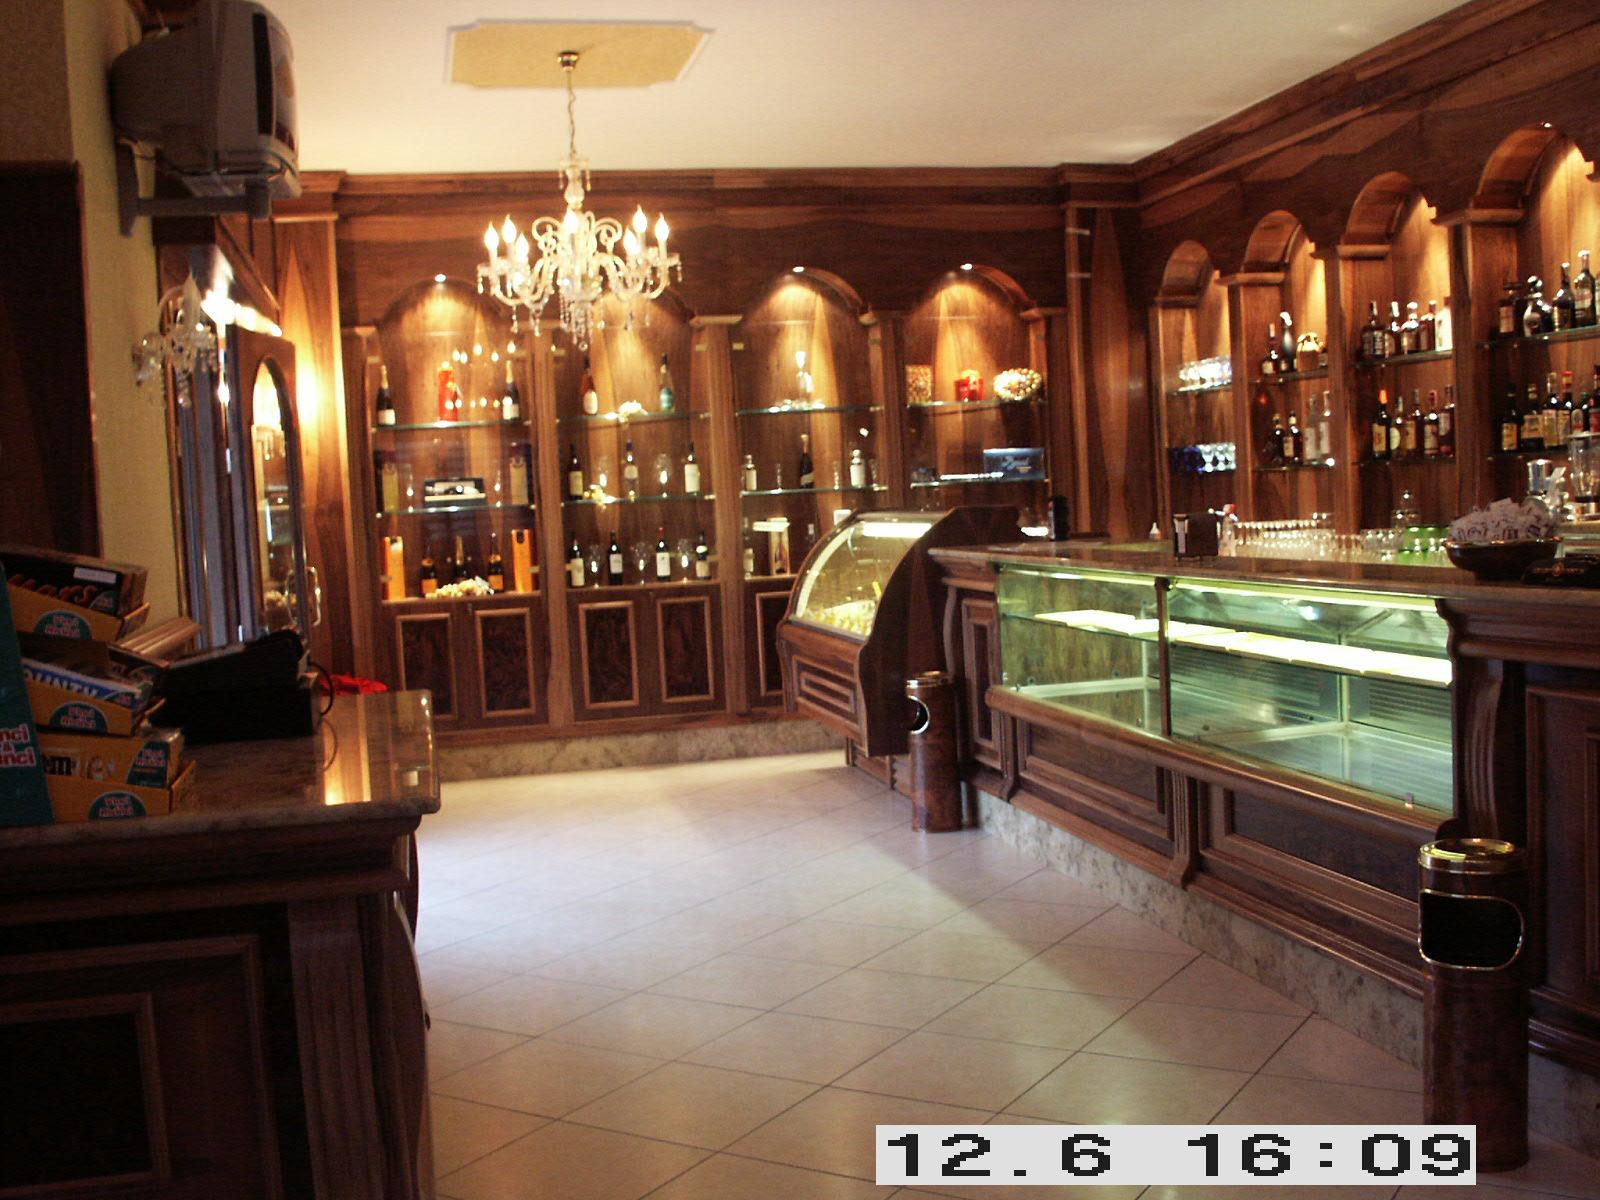 Arredamento bar for Arredamenti bar brescia